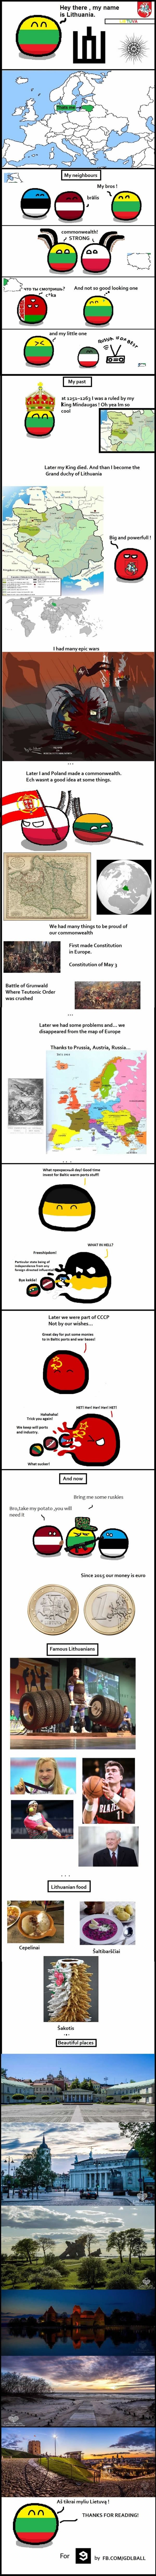 Meet Lithuania